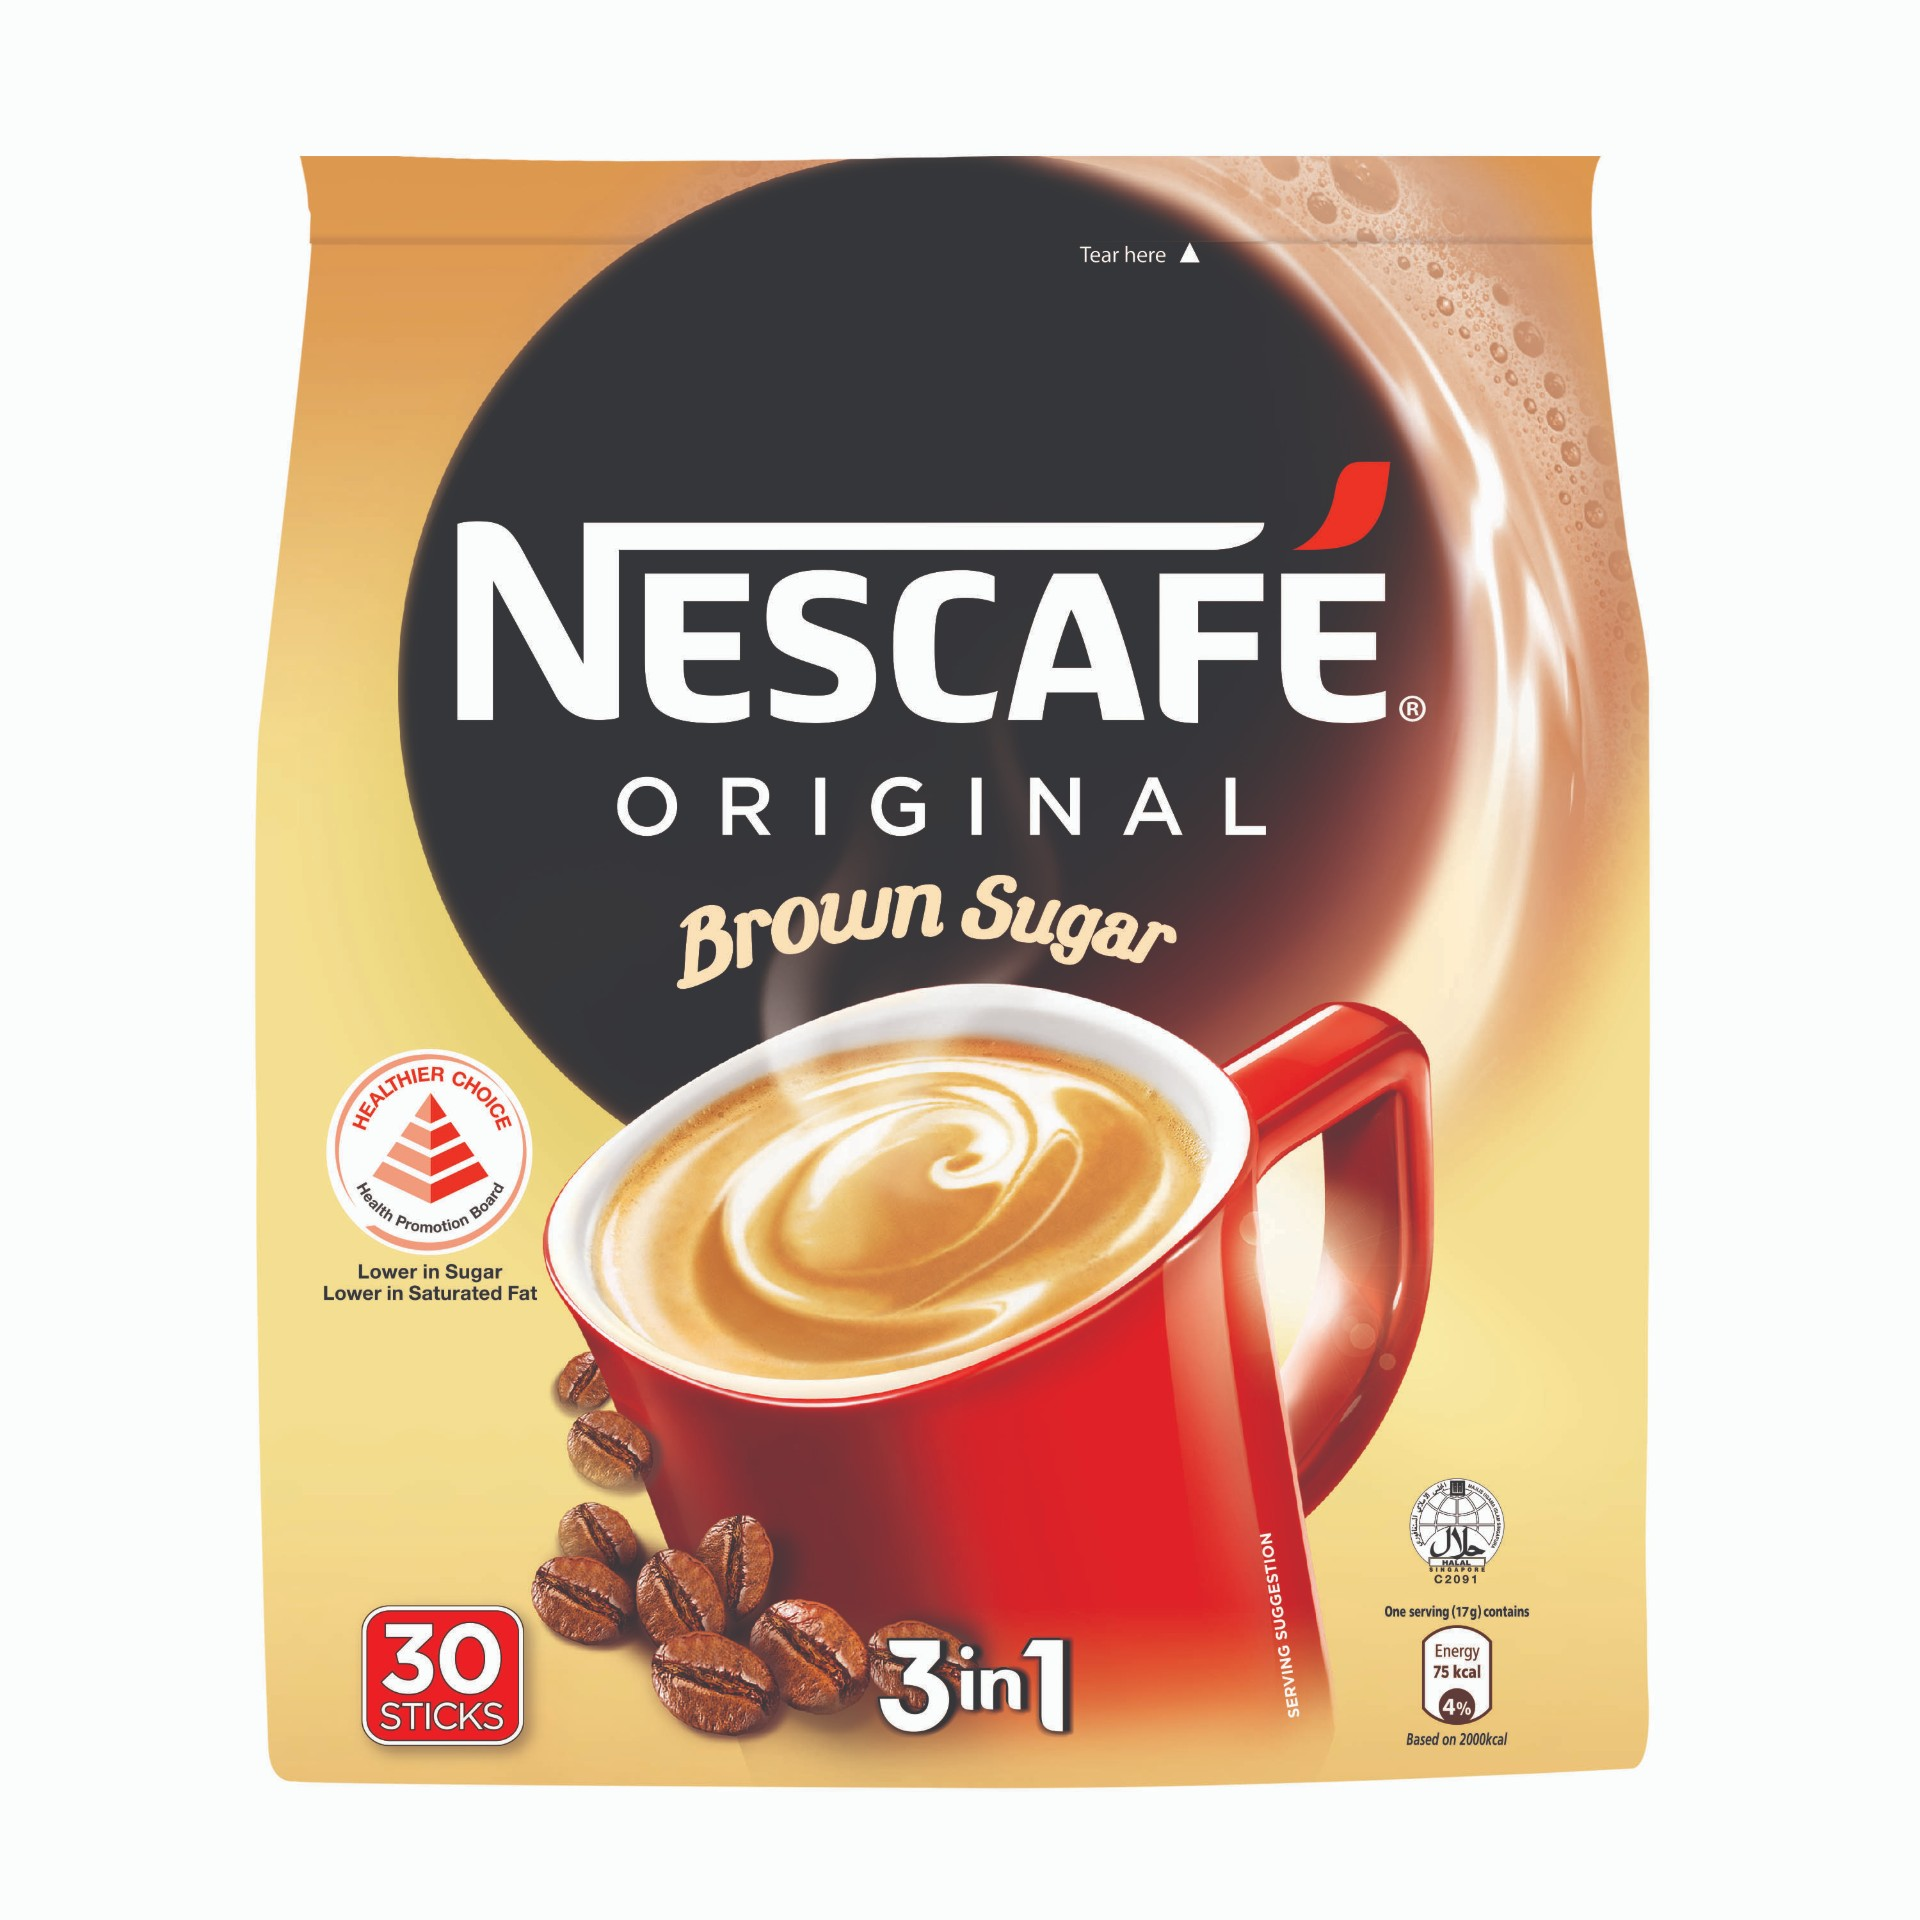 Nescafe 3in1 Original Brown Sugar Coffee